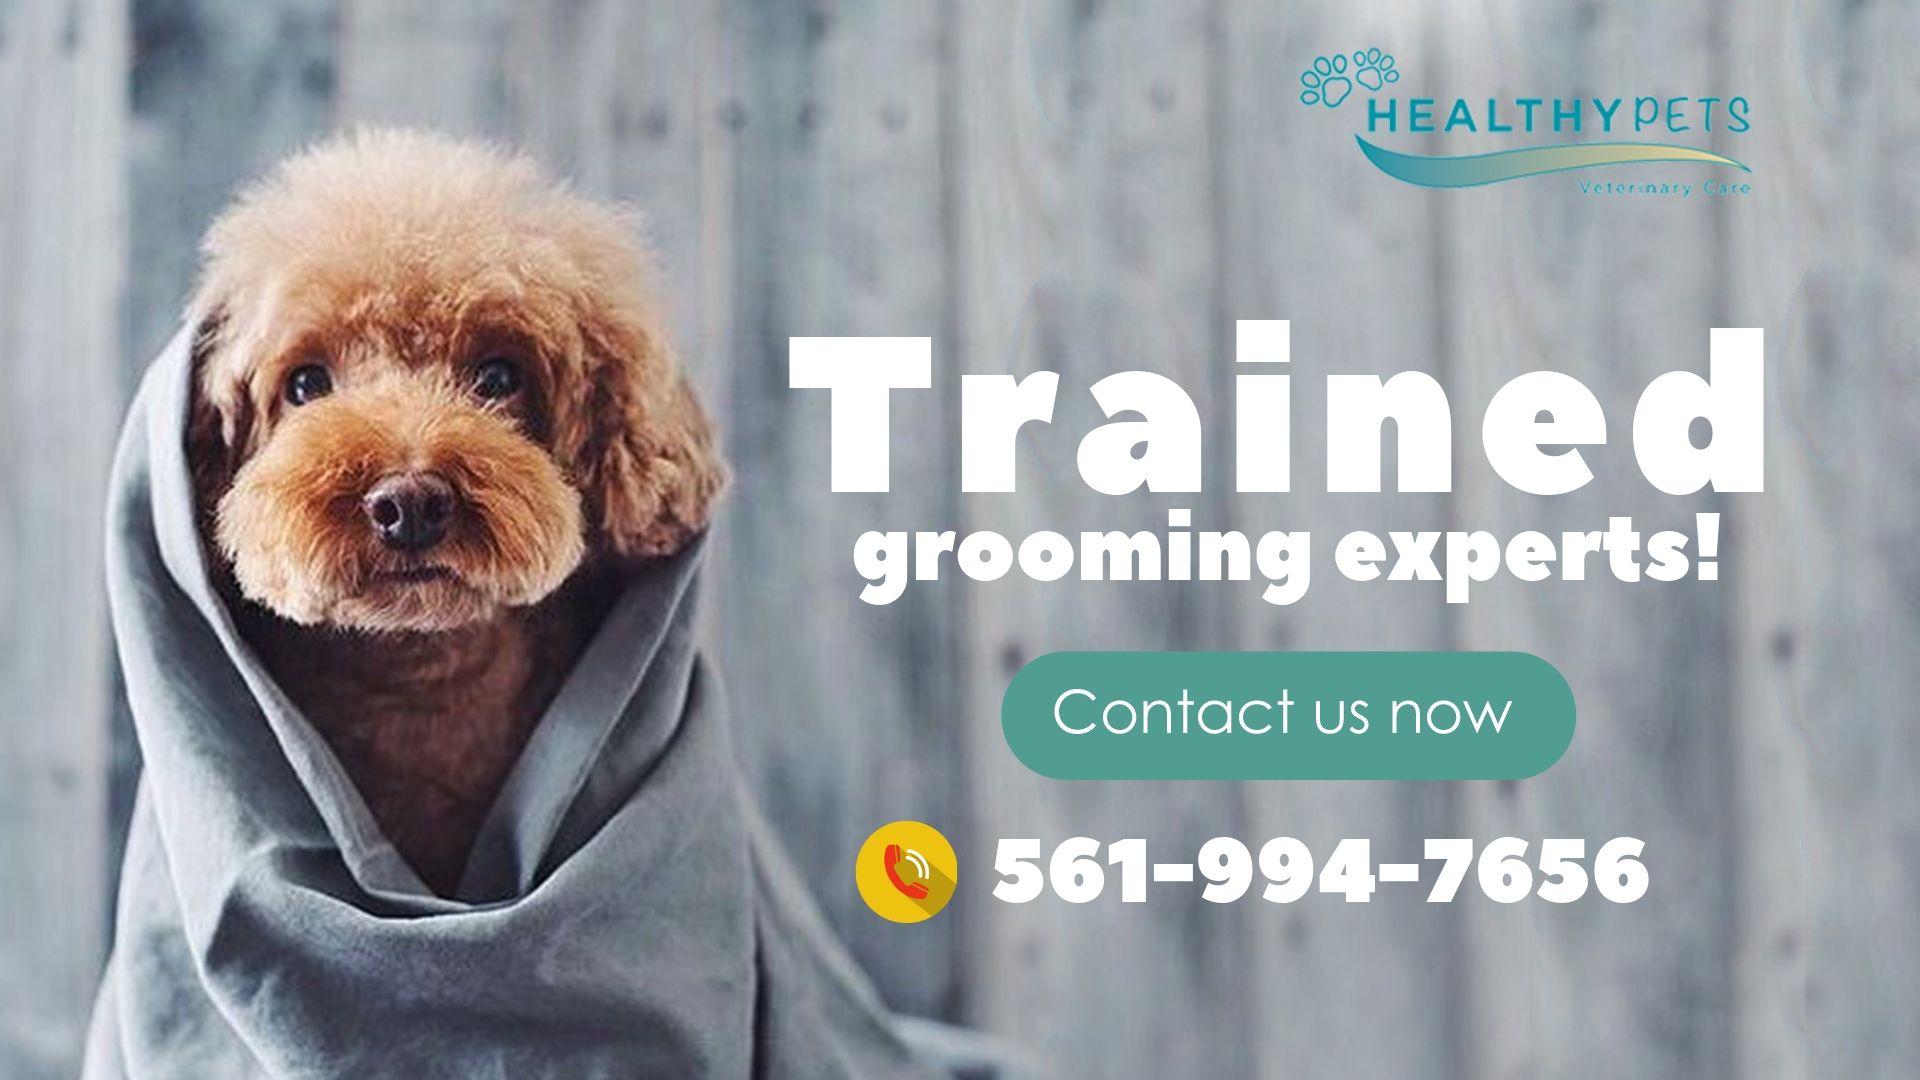 Dog Grooming Services Near Boca Raton Fl Healthy Pets Dog